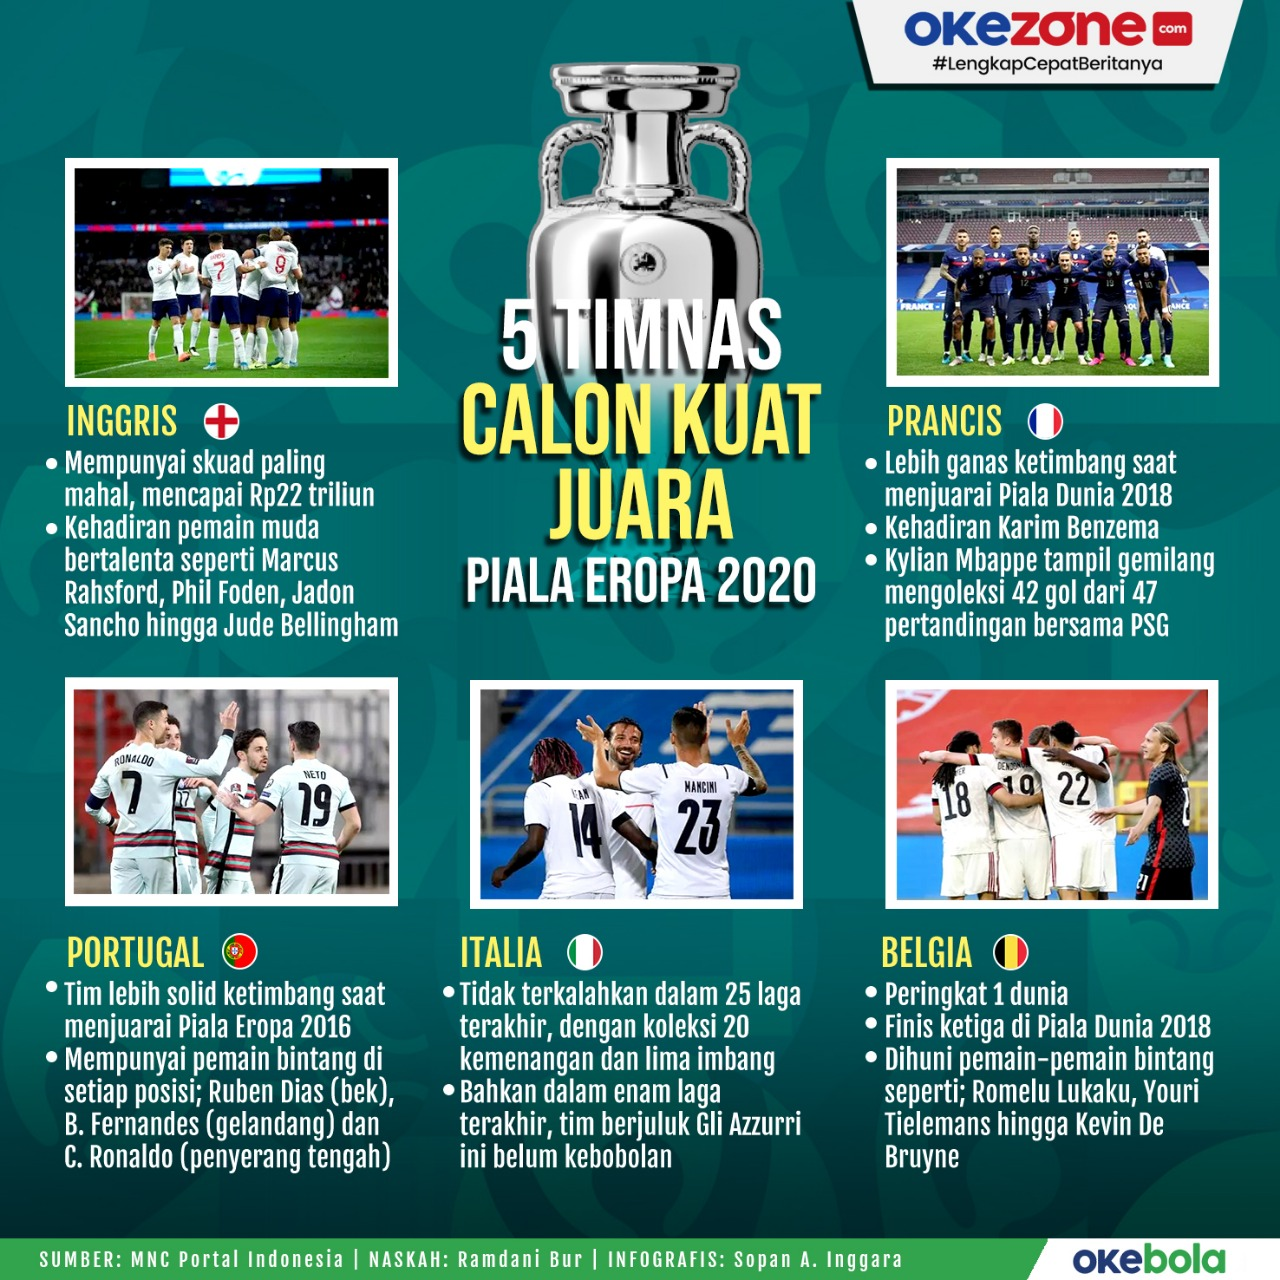 5 Timnas Calon Kuat Juara Piala Eropa 2020 -